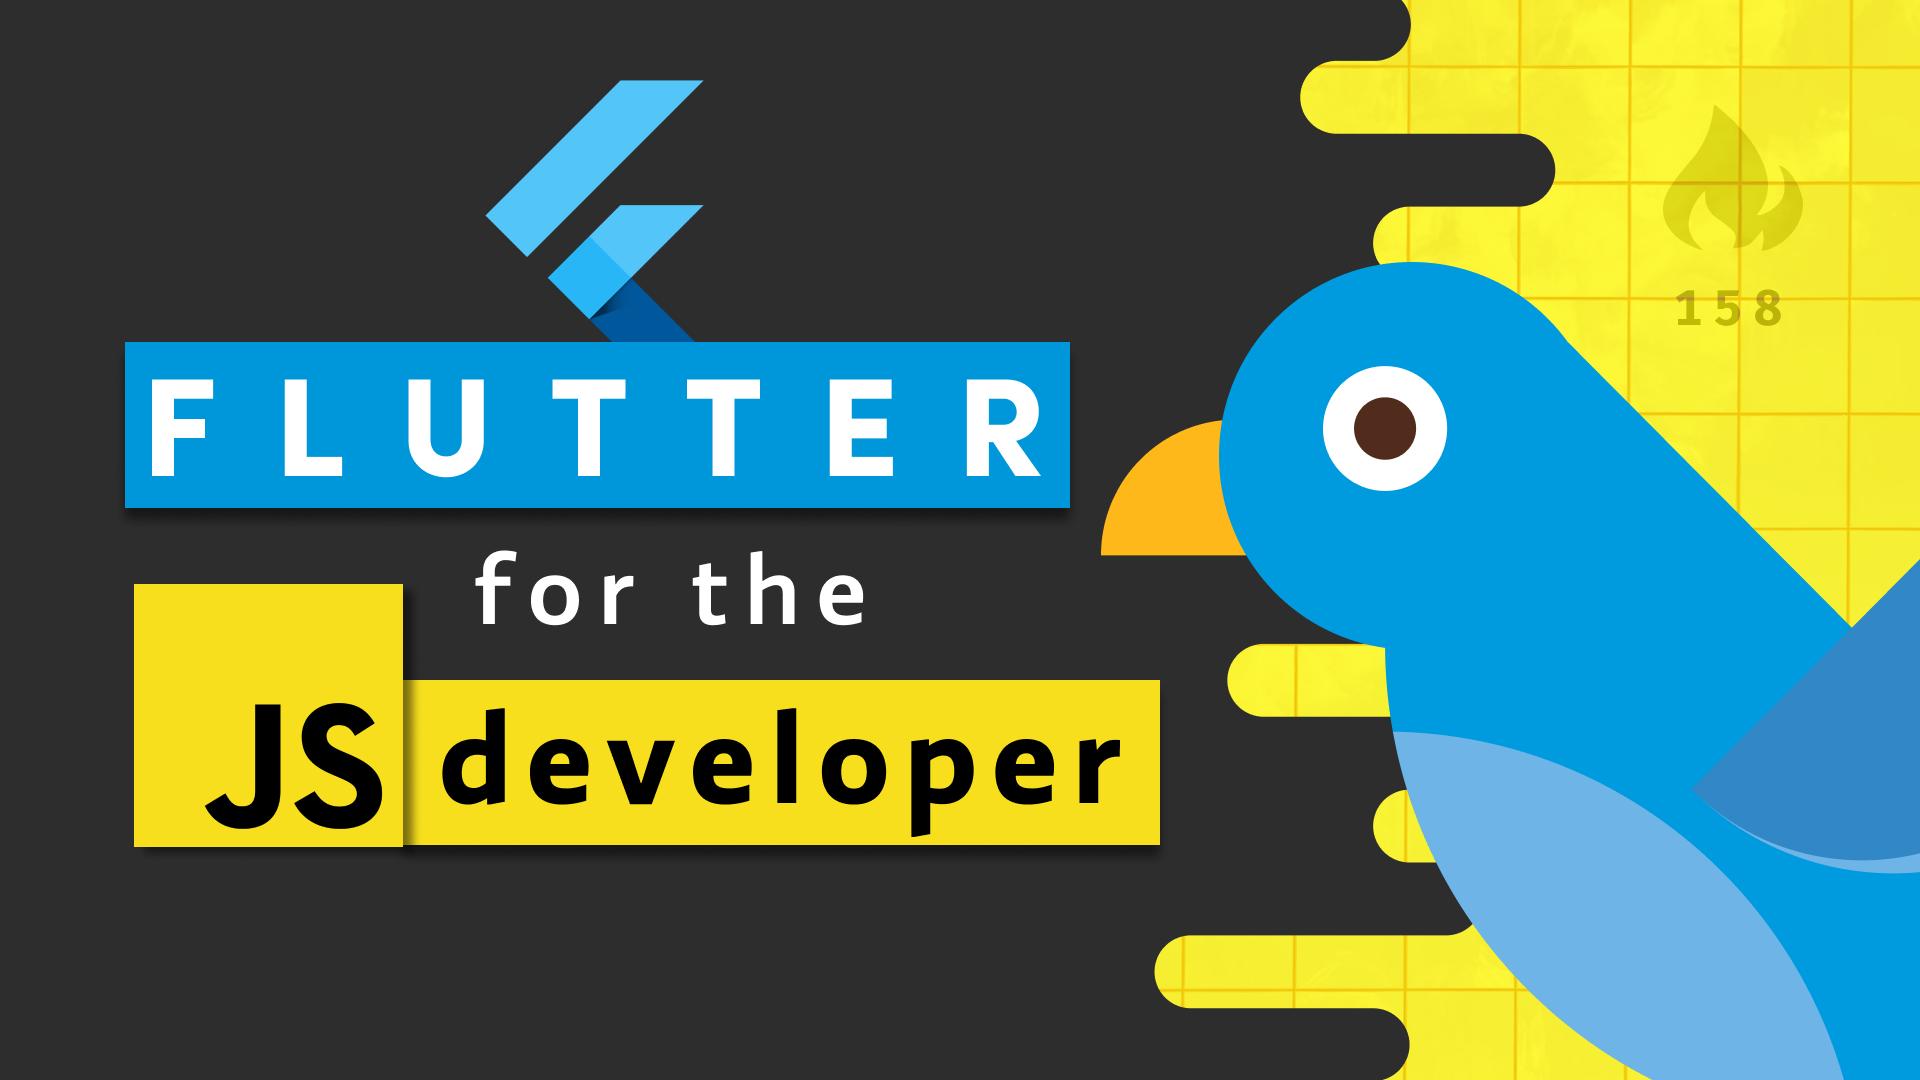 Flutter for JavaScript Developers